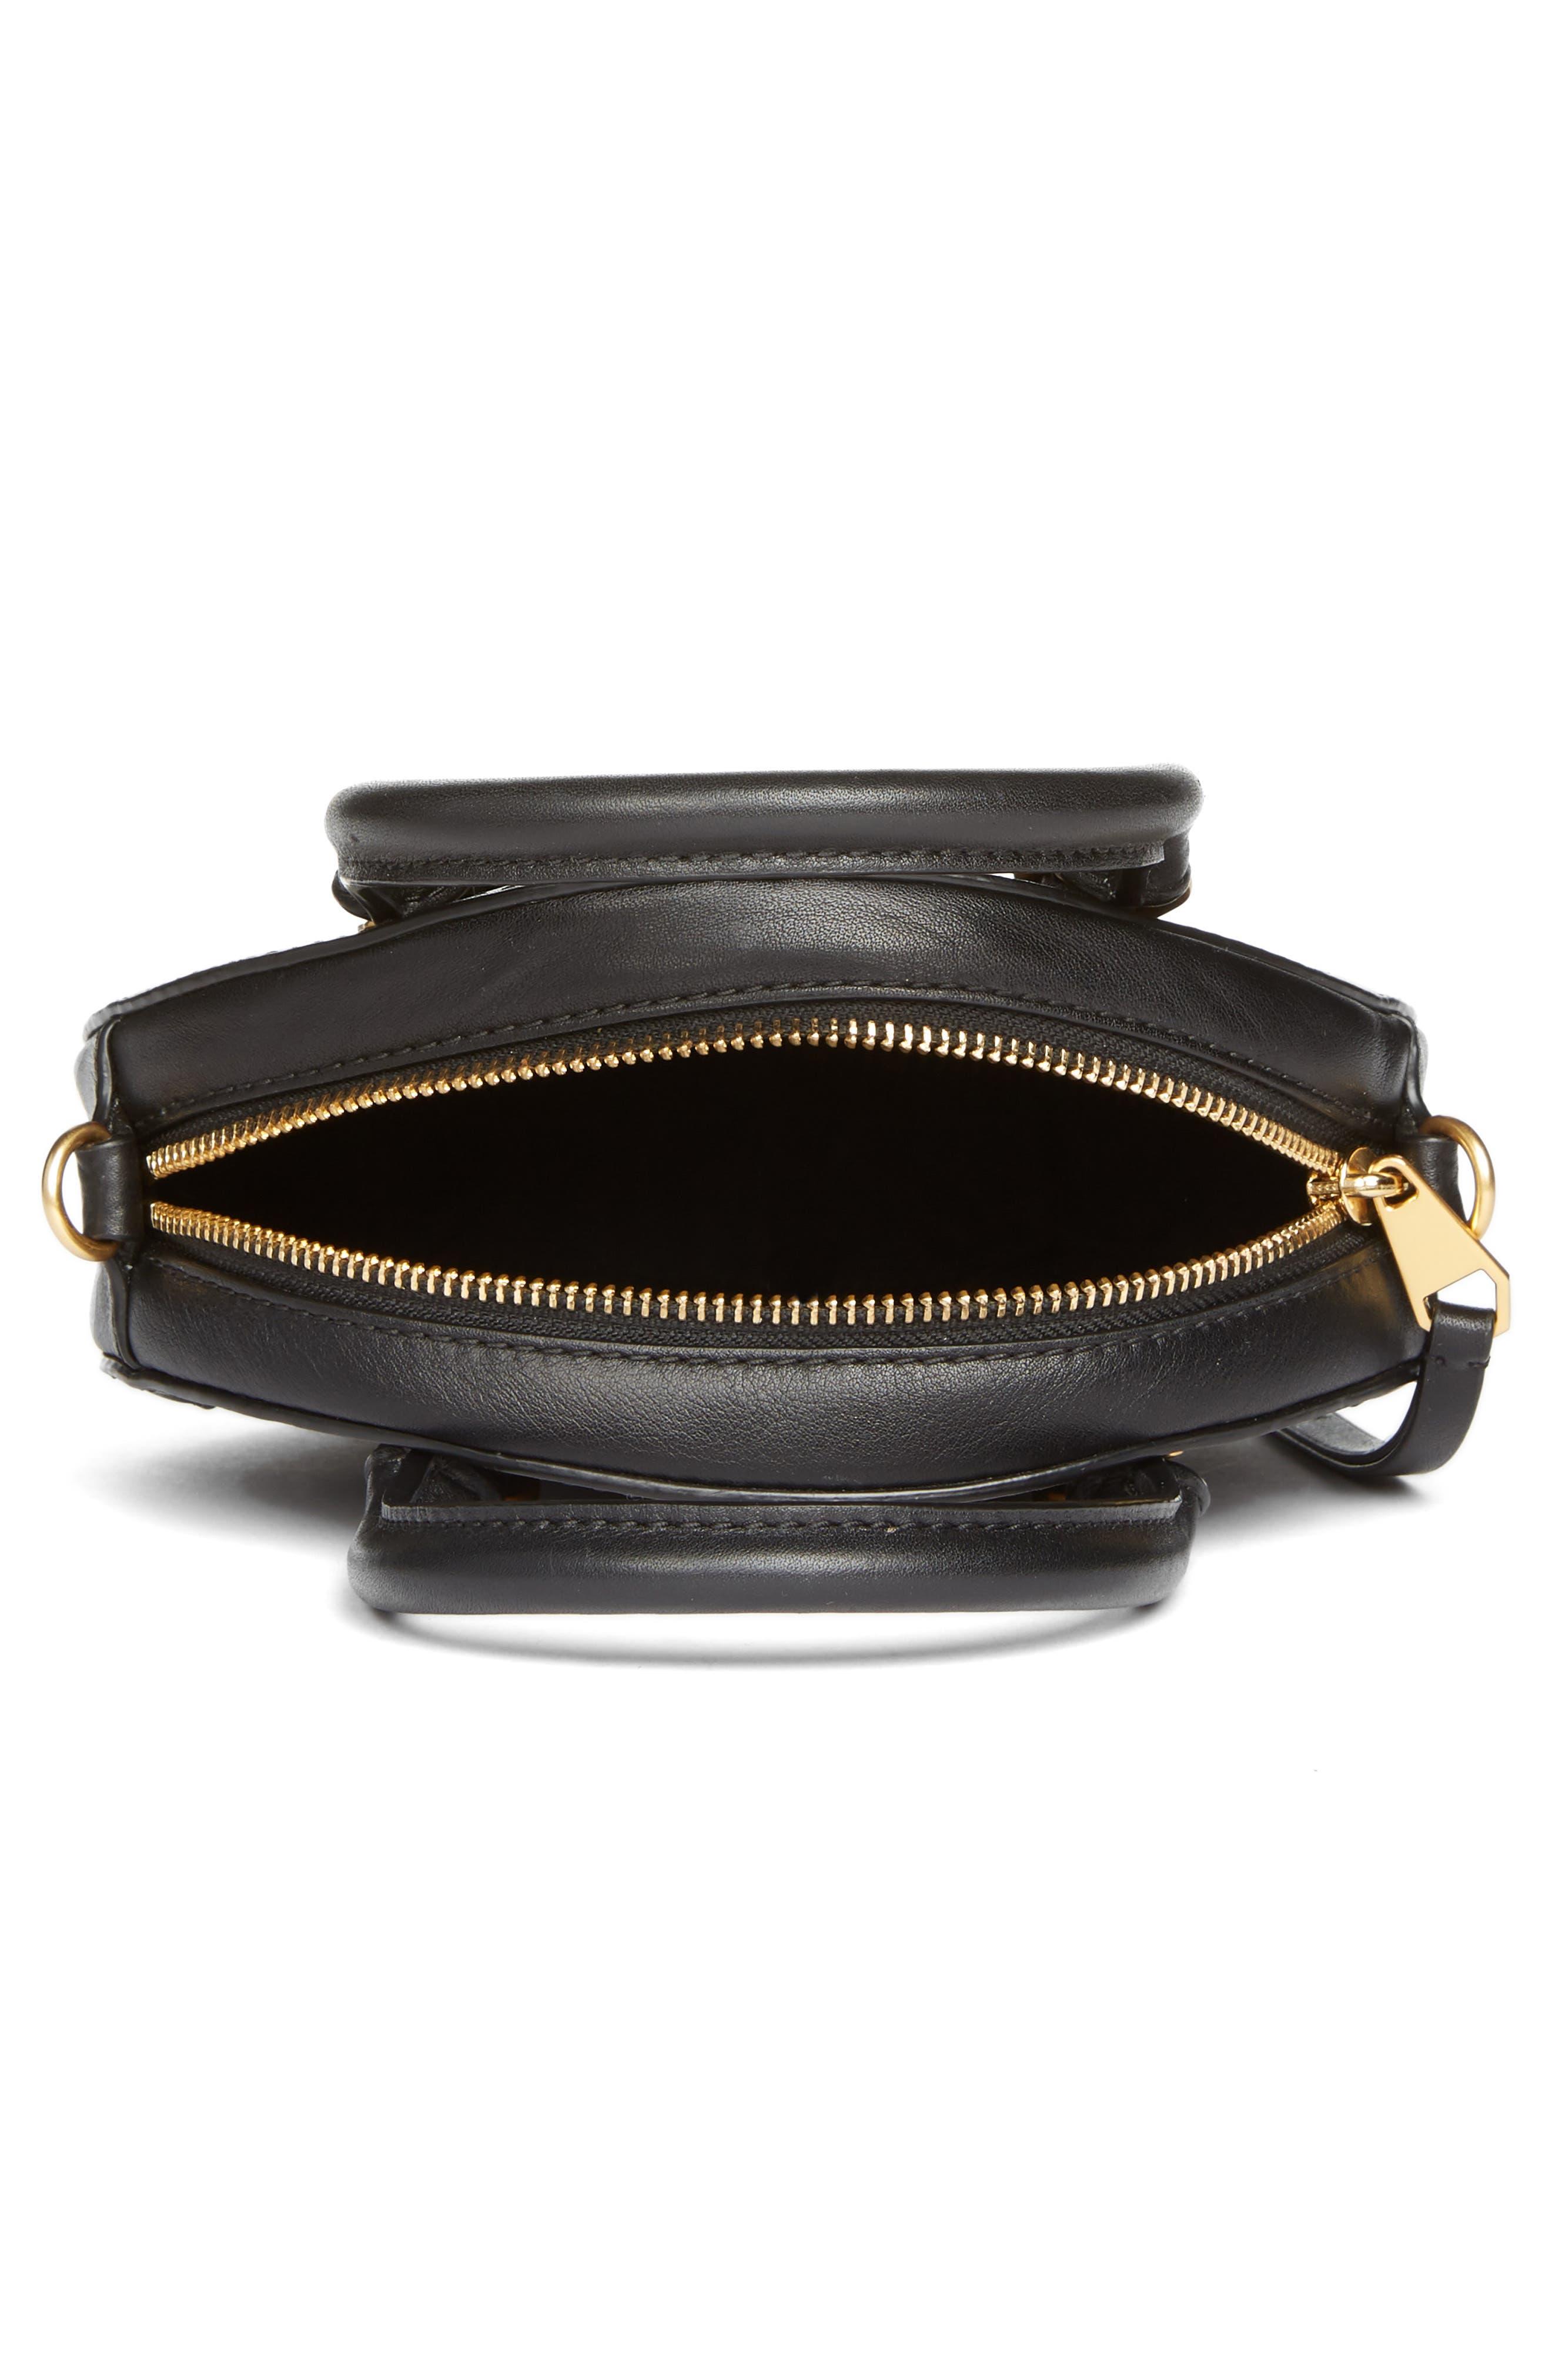 Bree Circle Leather Crossbody Bag,                             Alternate thumbnail 4, color,                             001